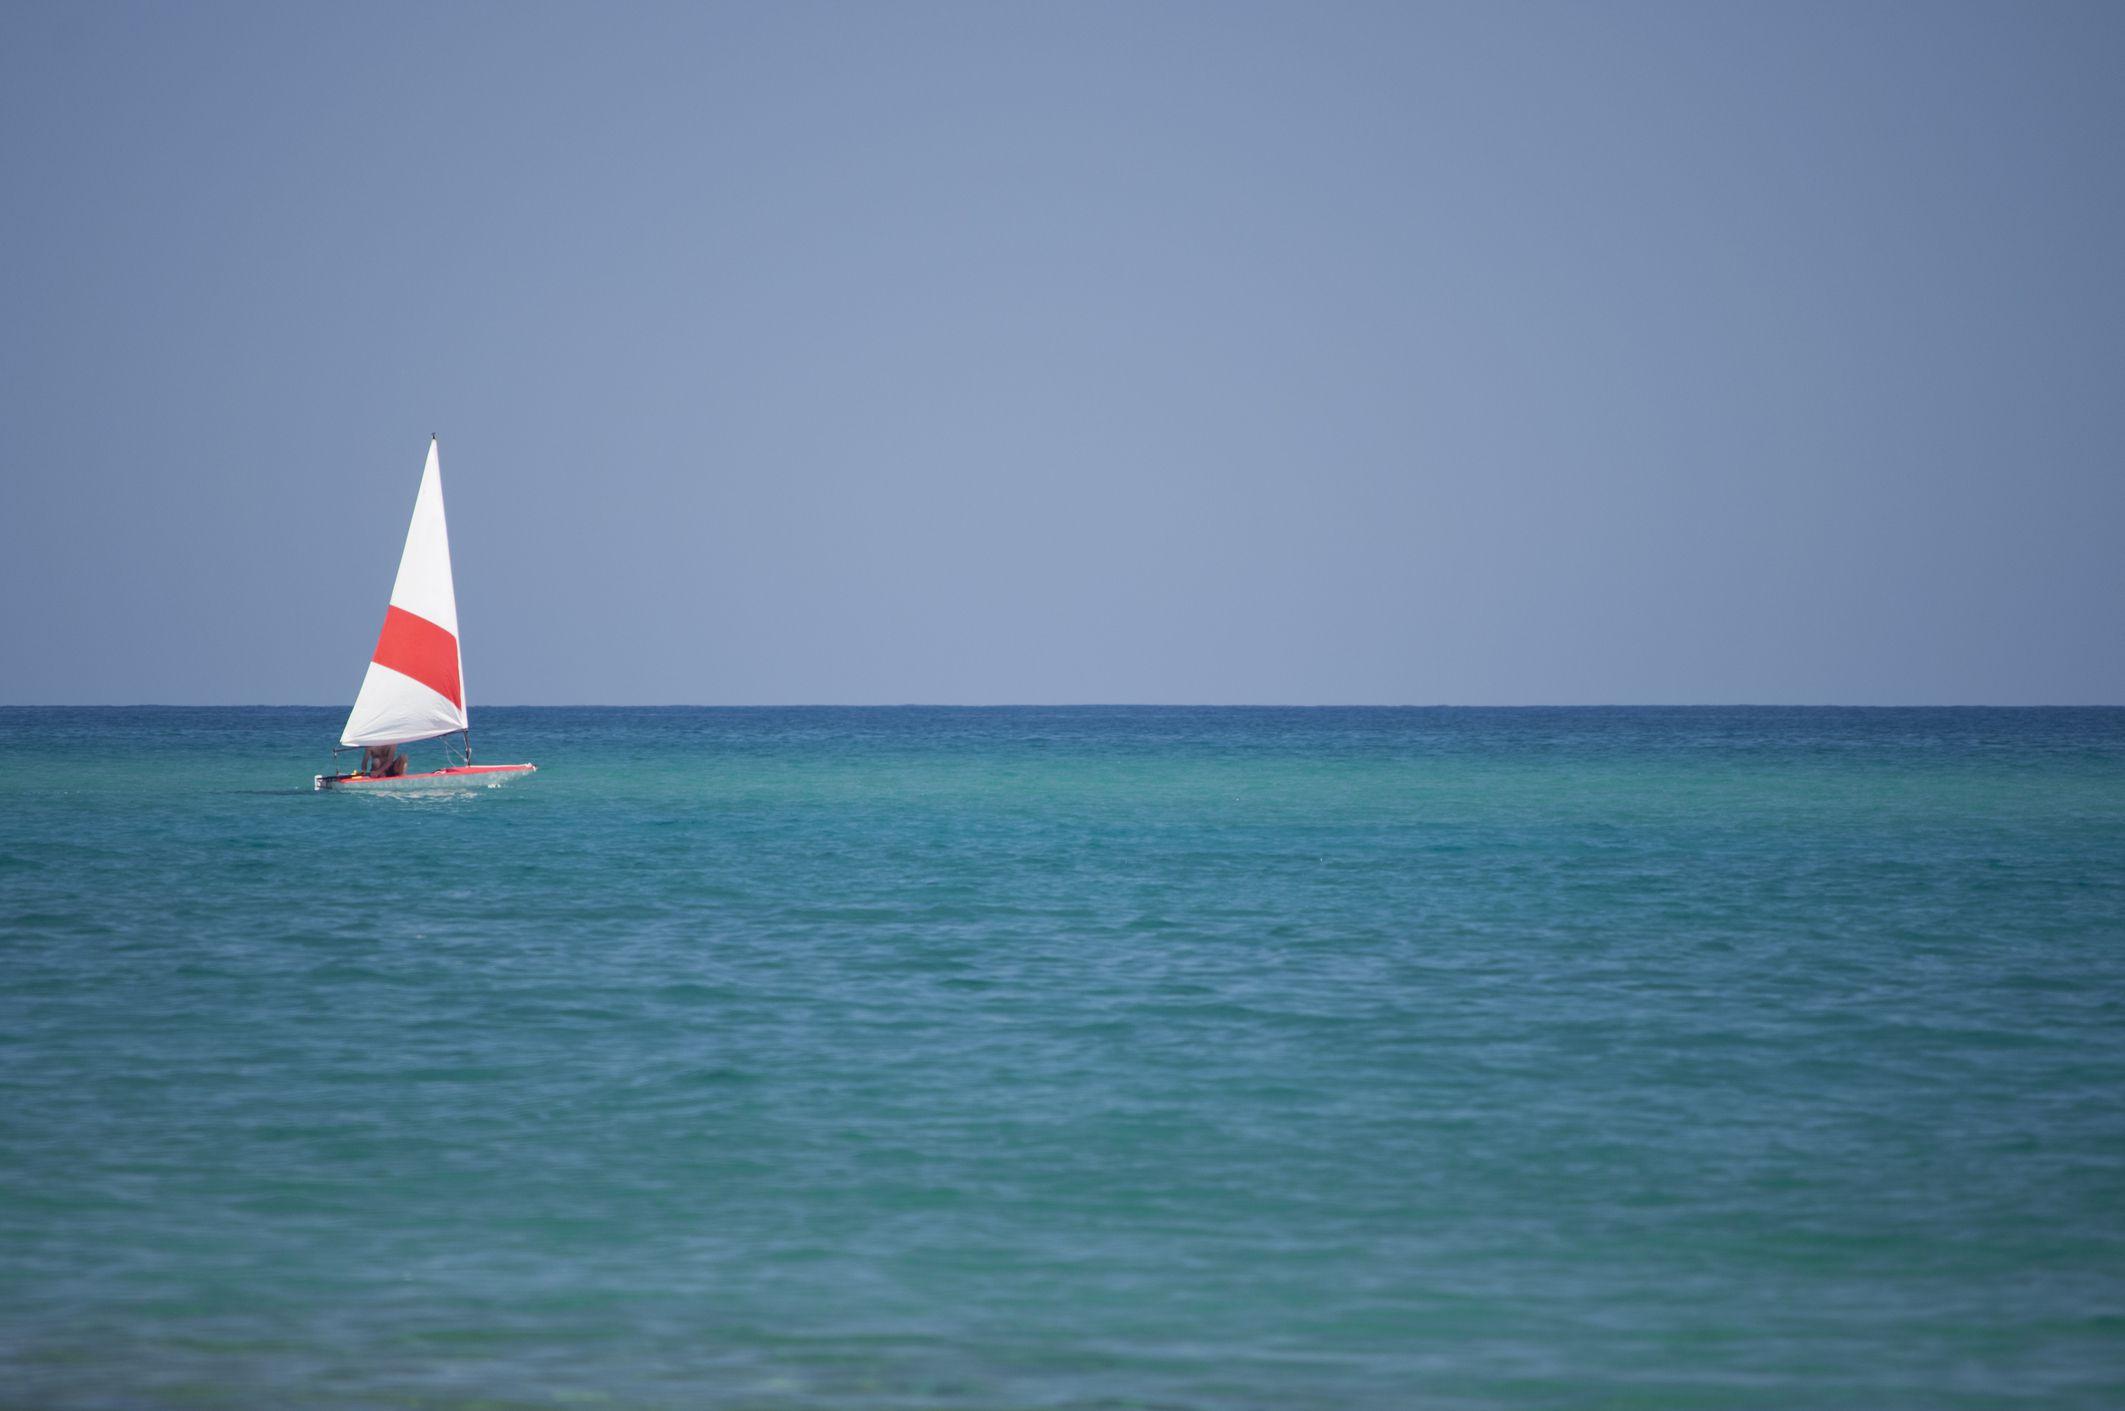 Small Sailboats on Mediterranean sea